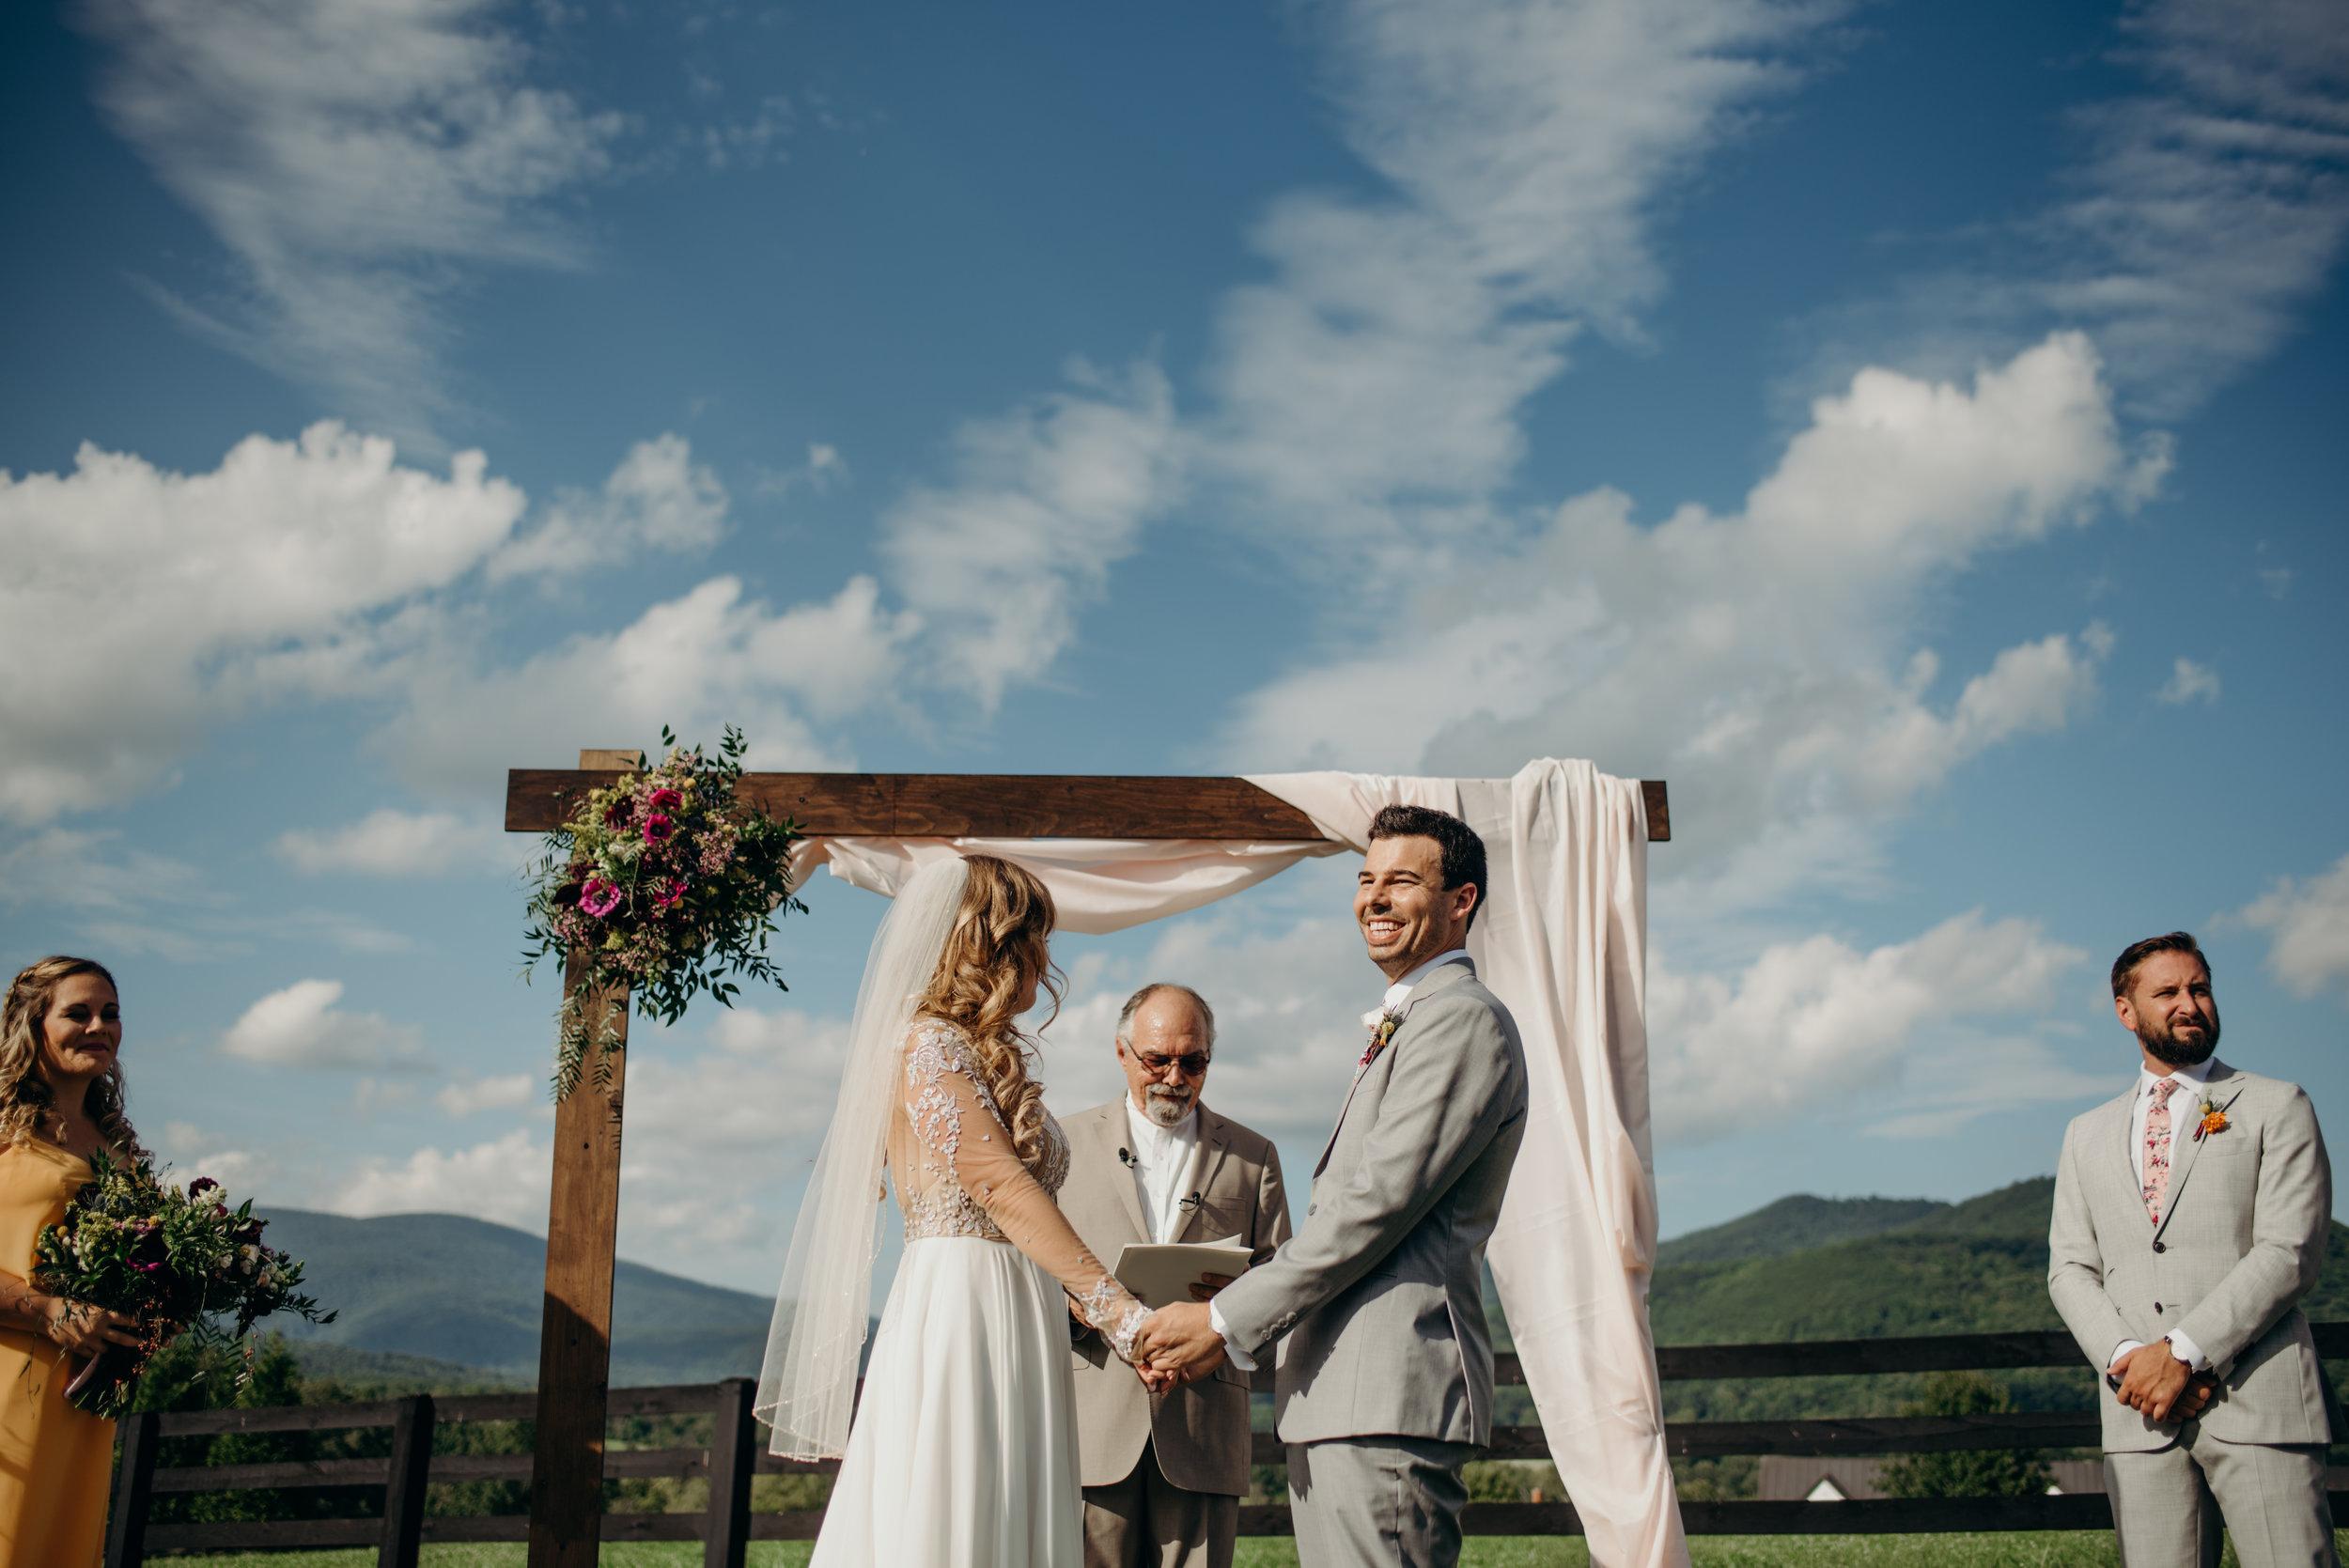 ryan-lauren-wedding-at-montfair-resort-farm-lindsey-paradiso-photography-7812.jpg